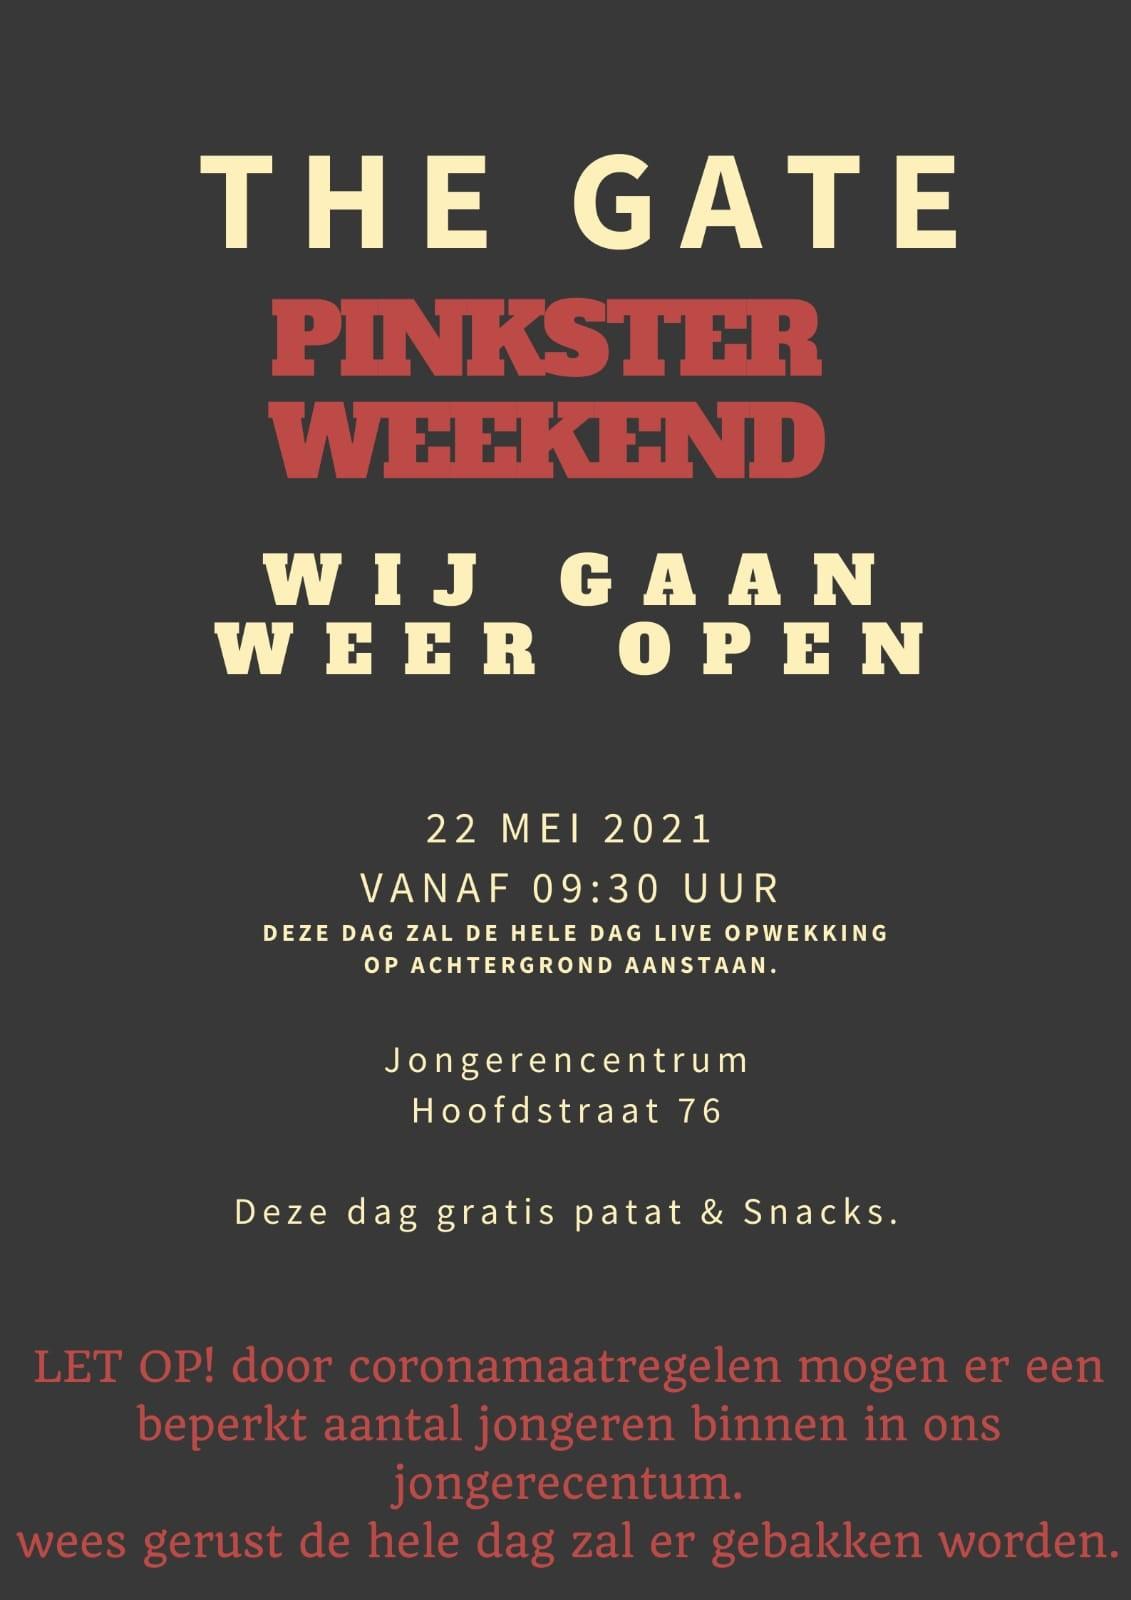 The Gate Pinksterweekend